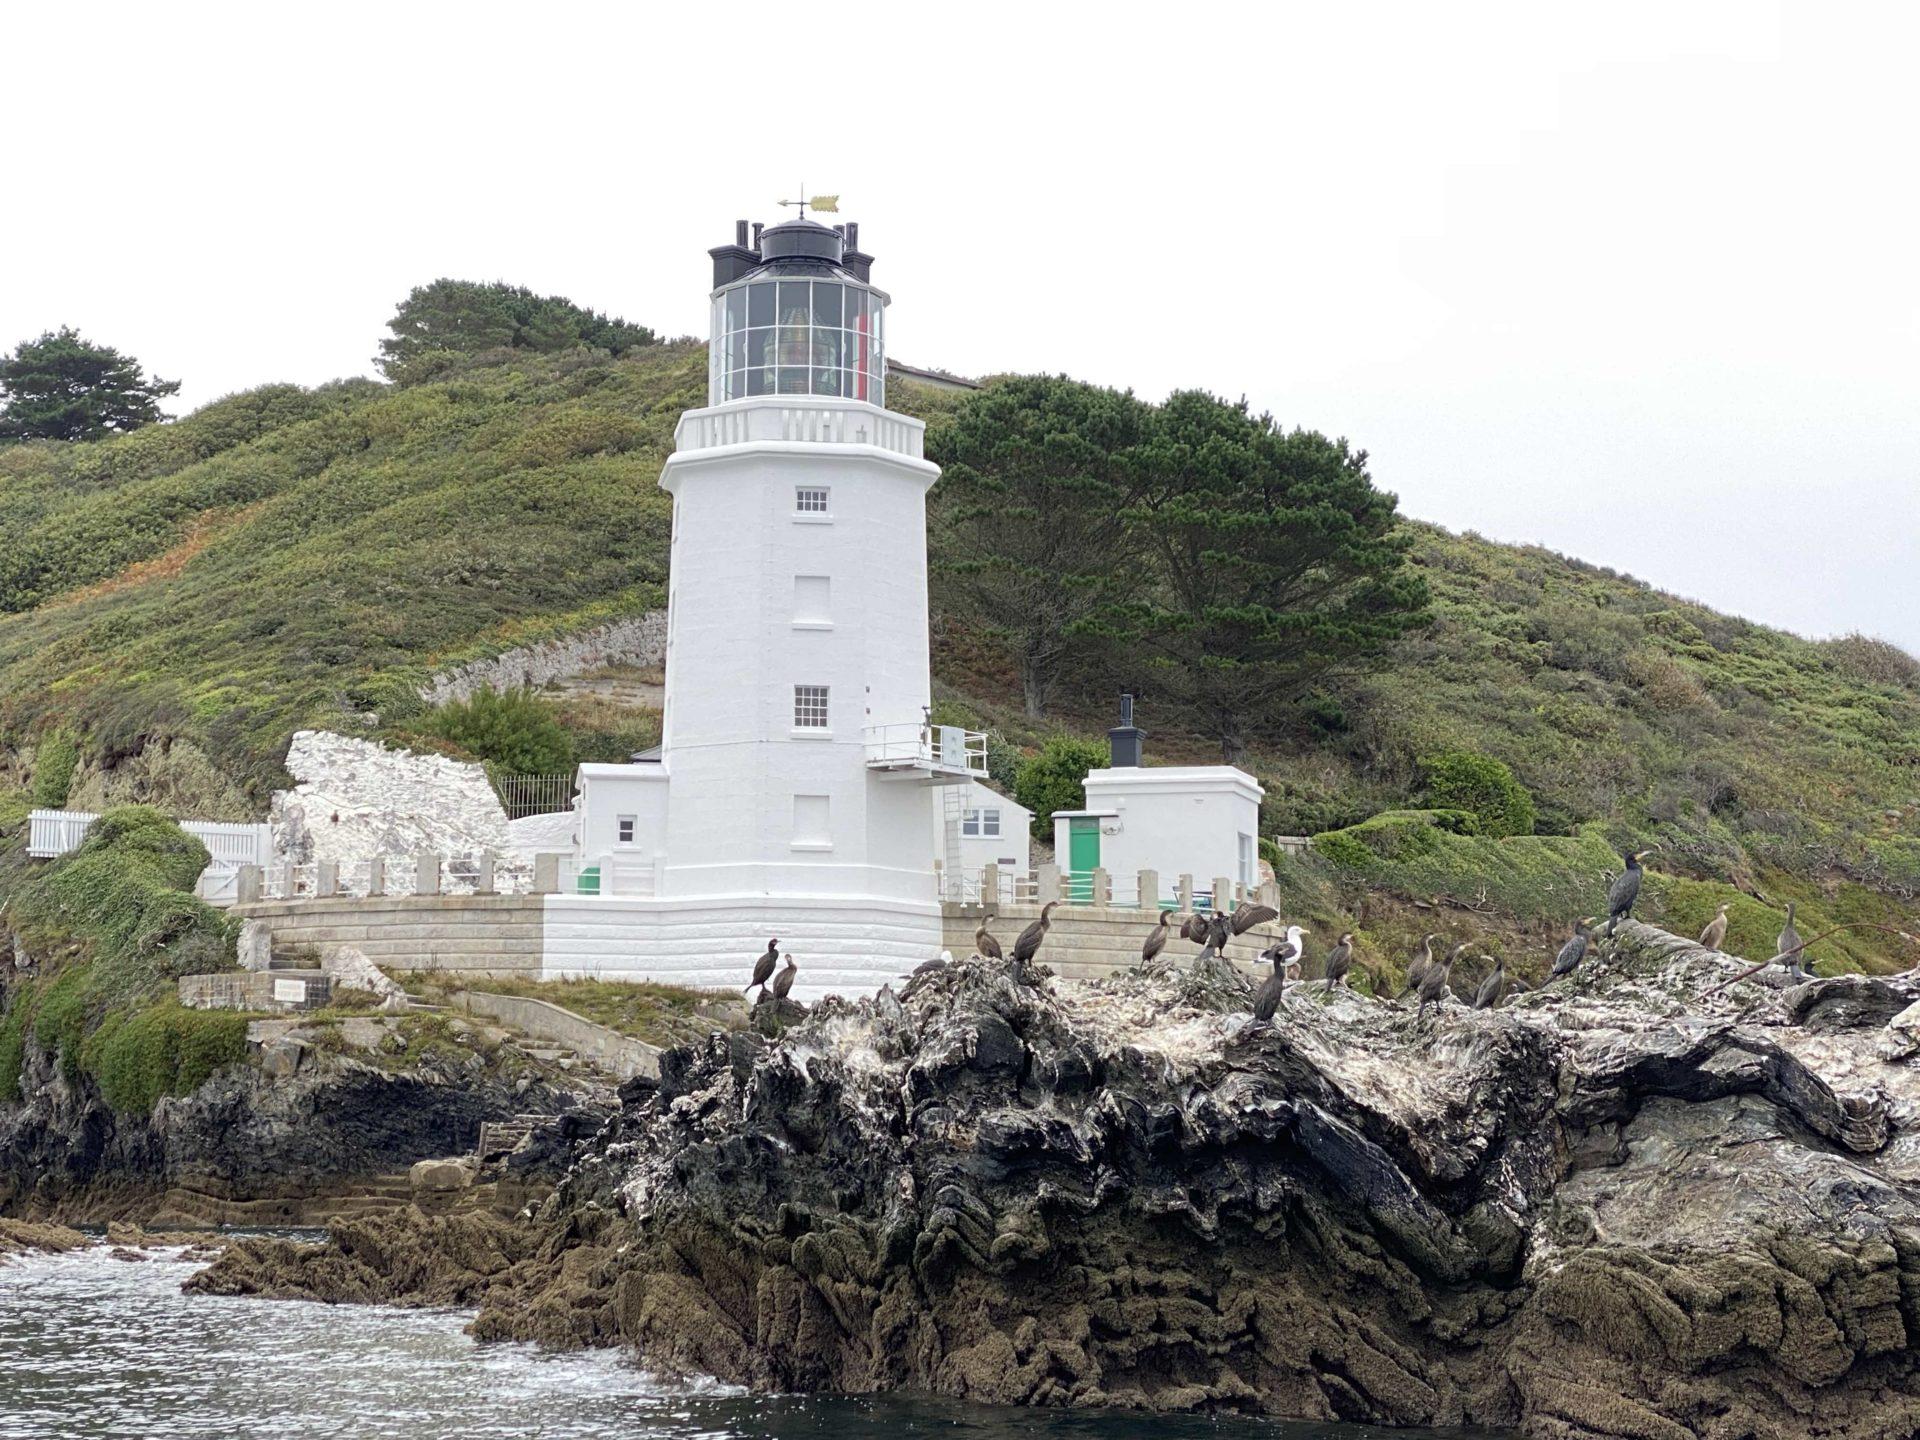 Shags and cormorants near St Anthony Lighthouse